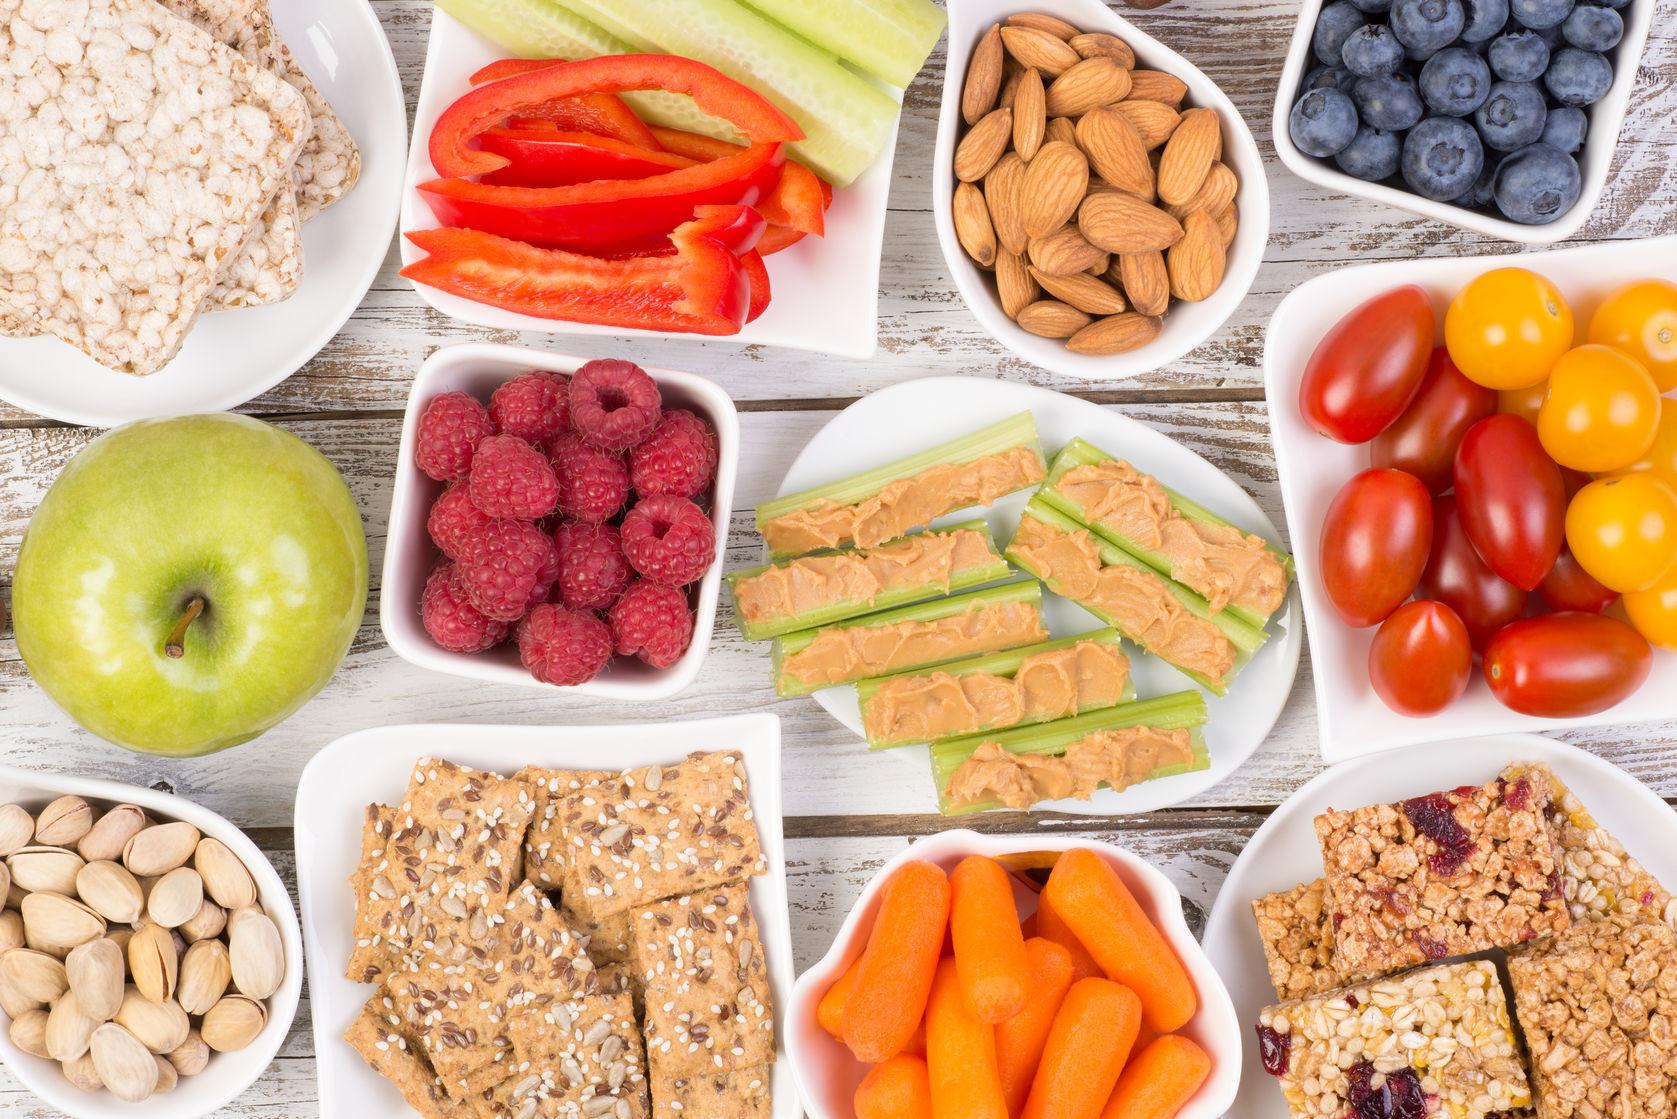 Very Healthy Snacks  5 Healthy Snack Ideas That Require NO Skills